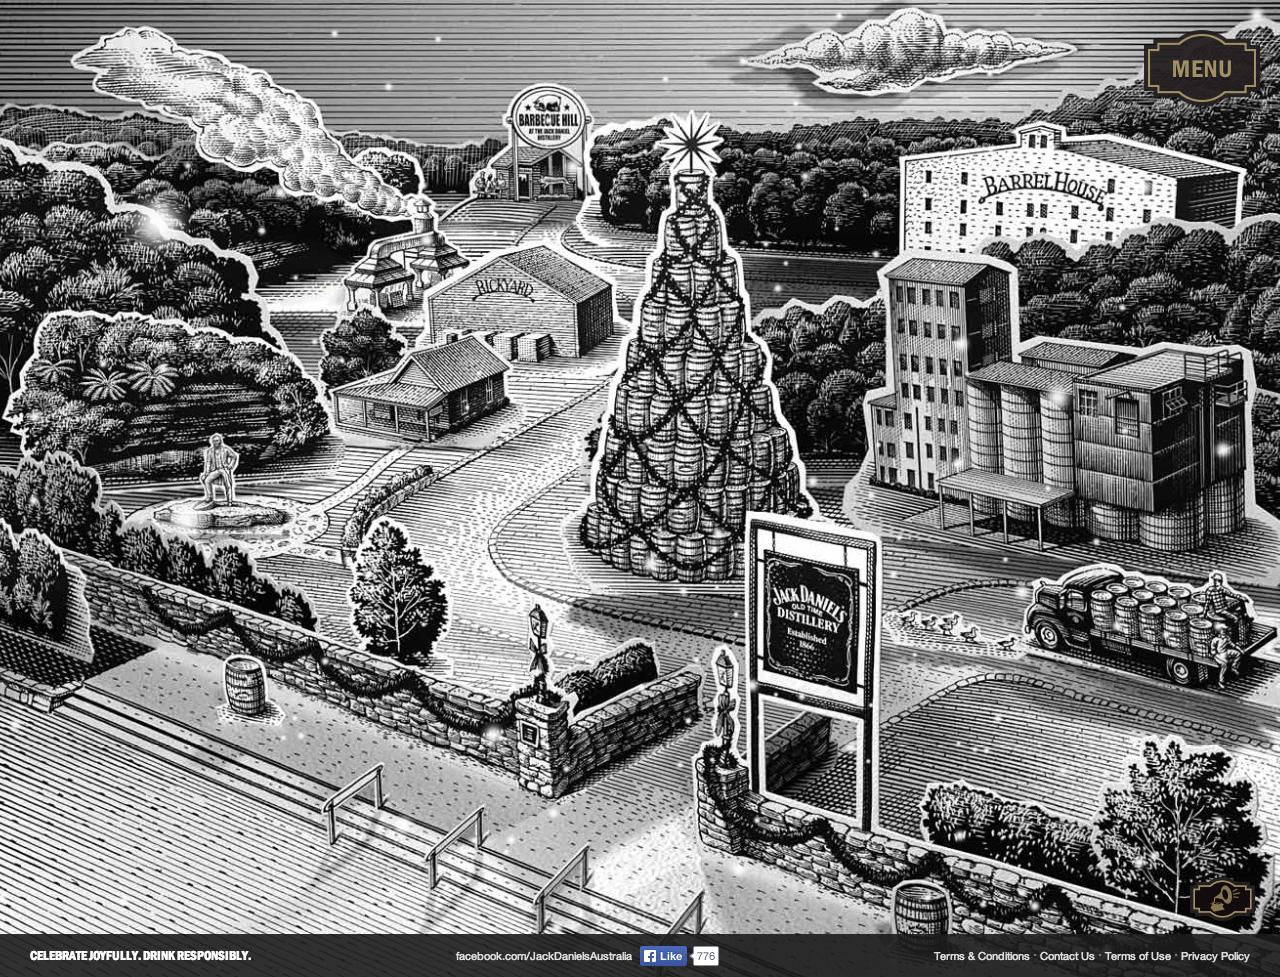 Jack Daniel's Holiday Select Website Screenshot